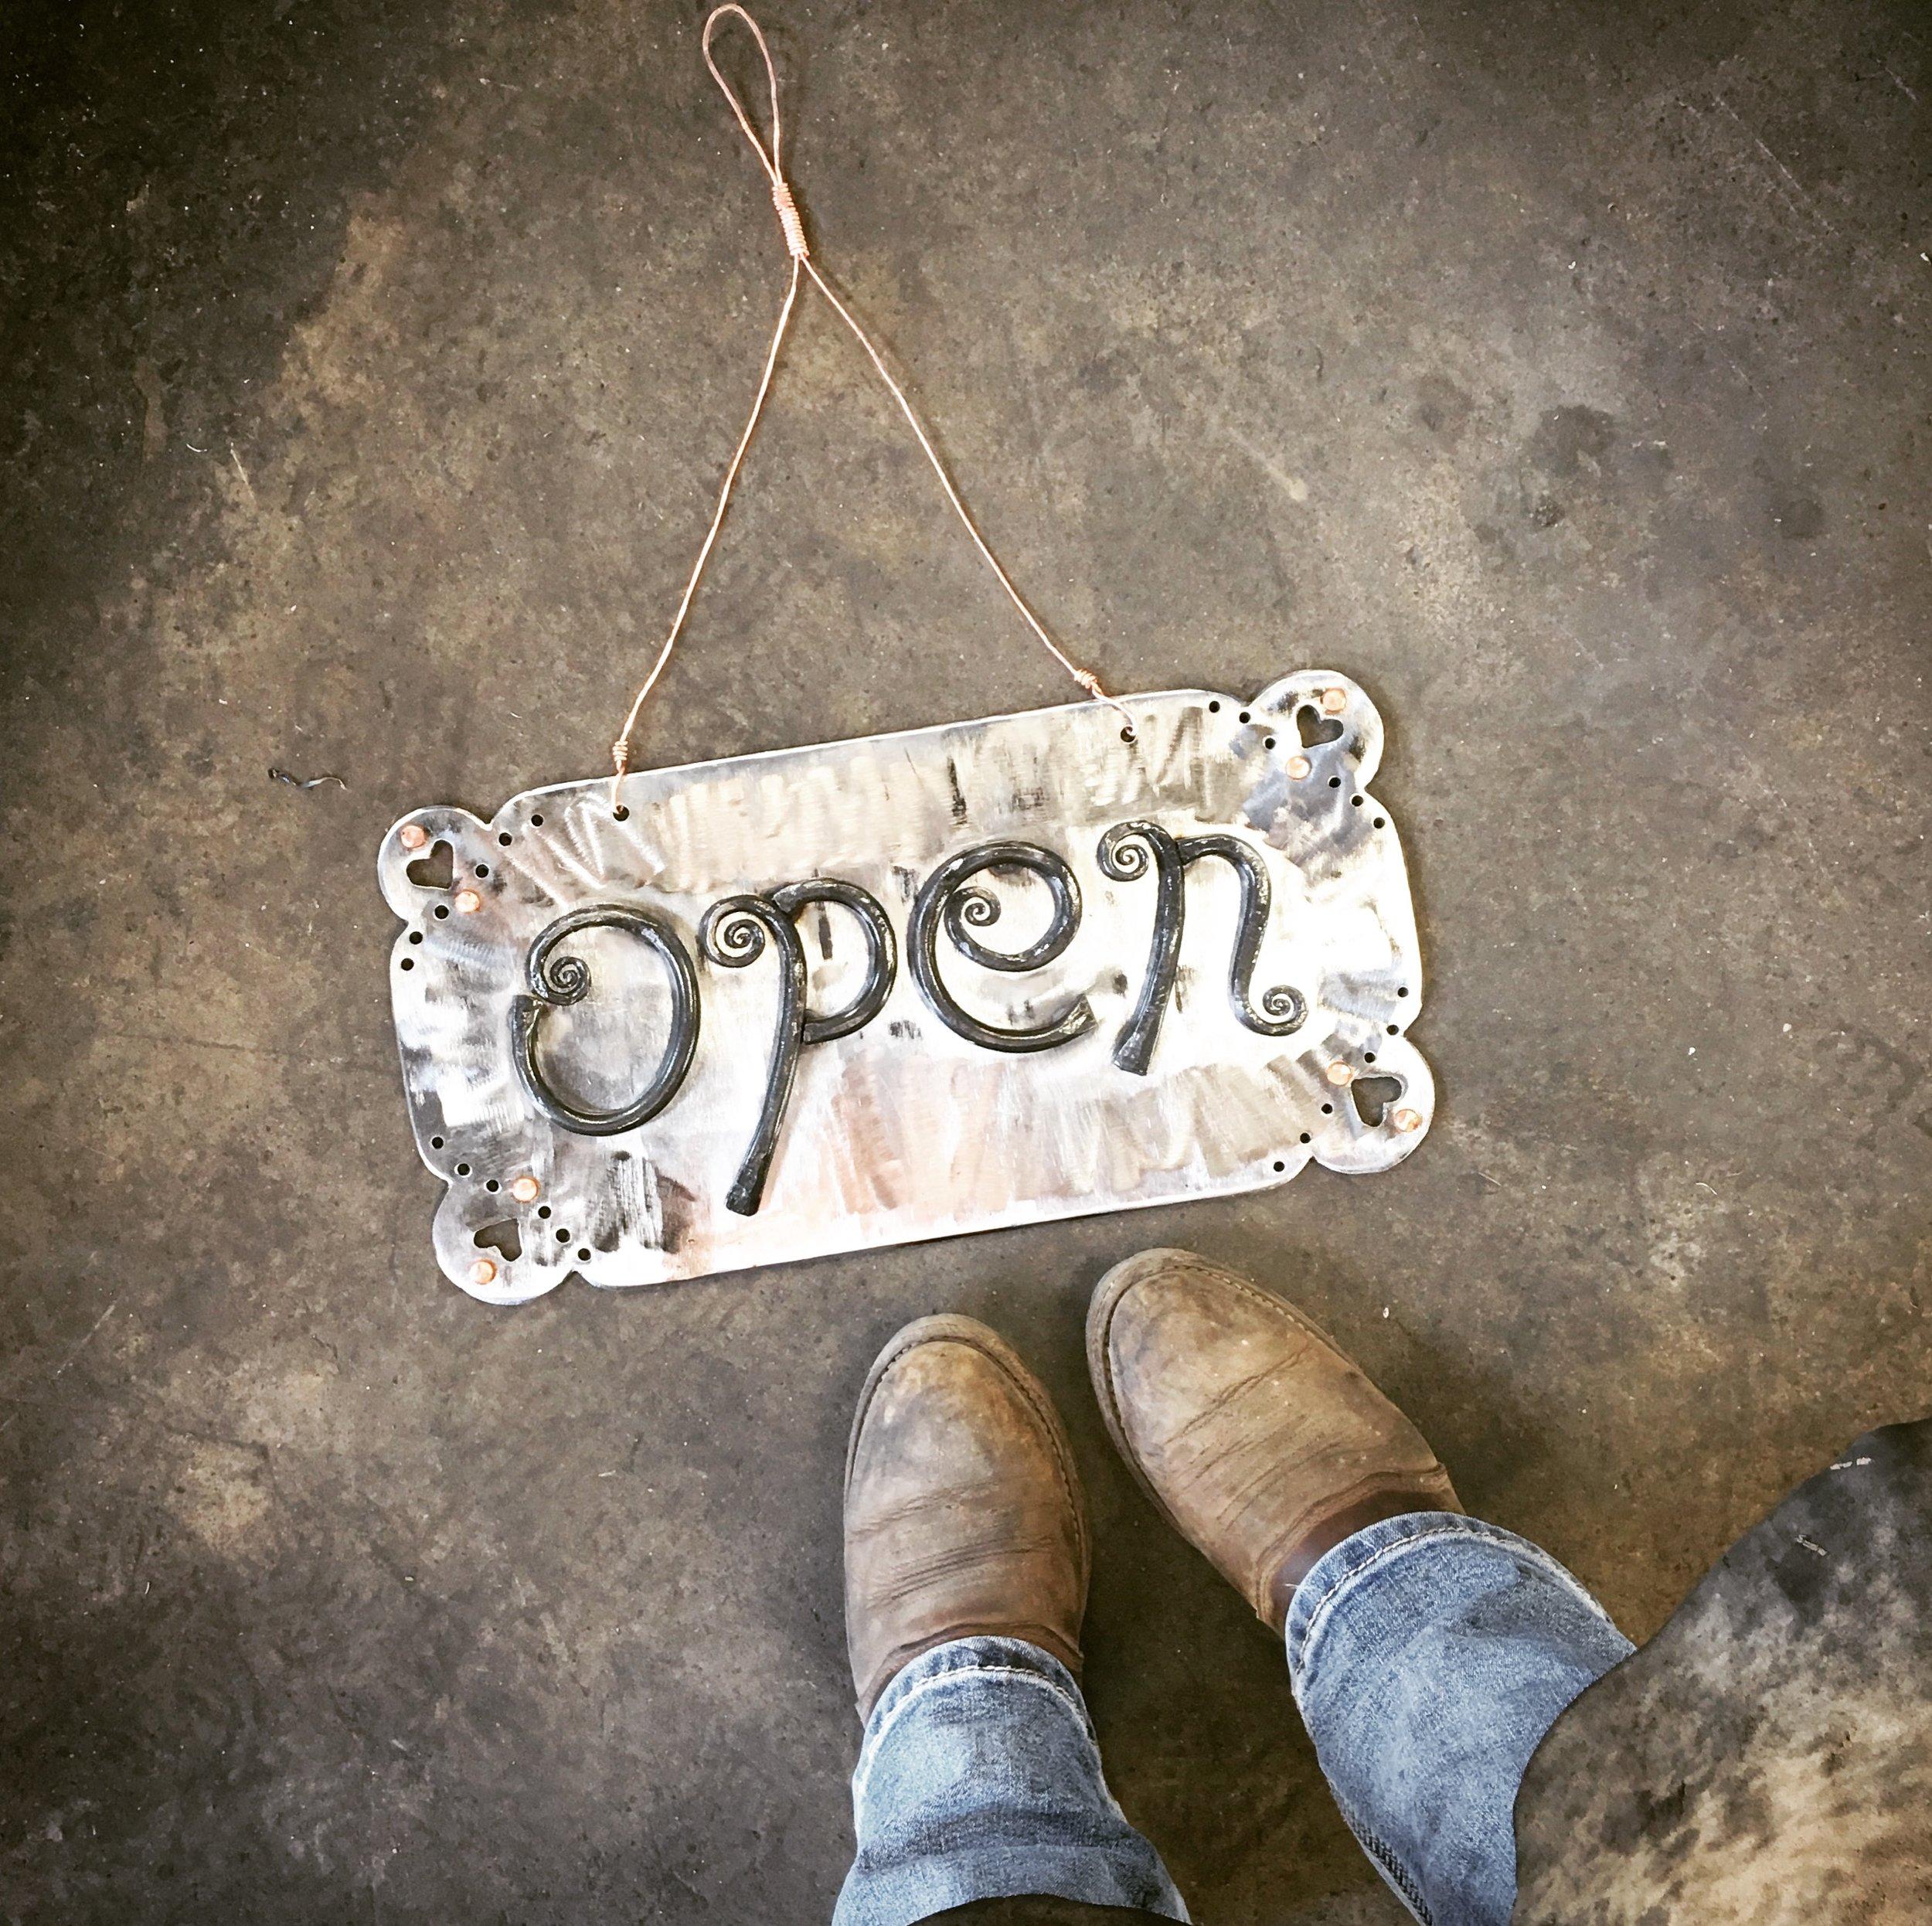 Backcountry Blacksmith's open sign!